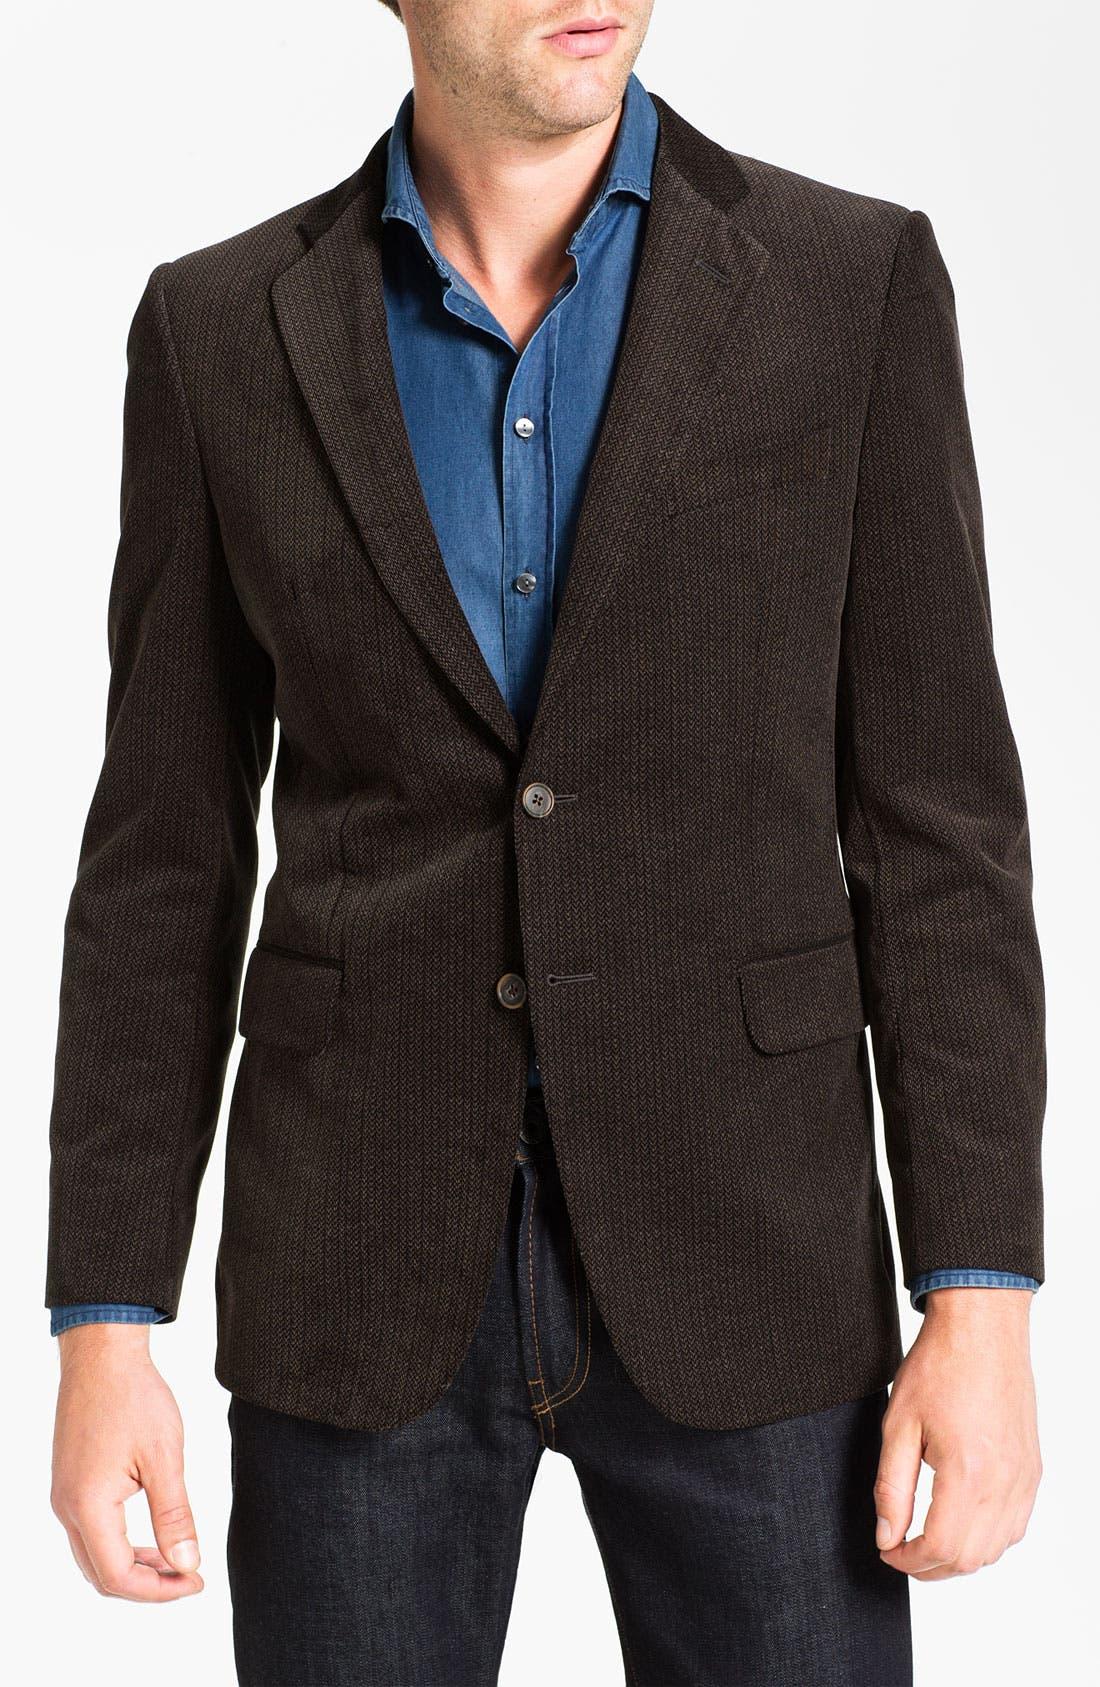 Main Image - Joseph Abboud Herringbone Cotton Sportcoat